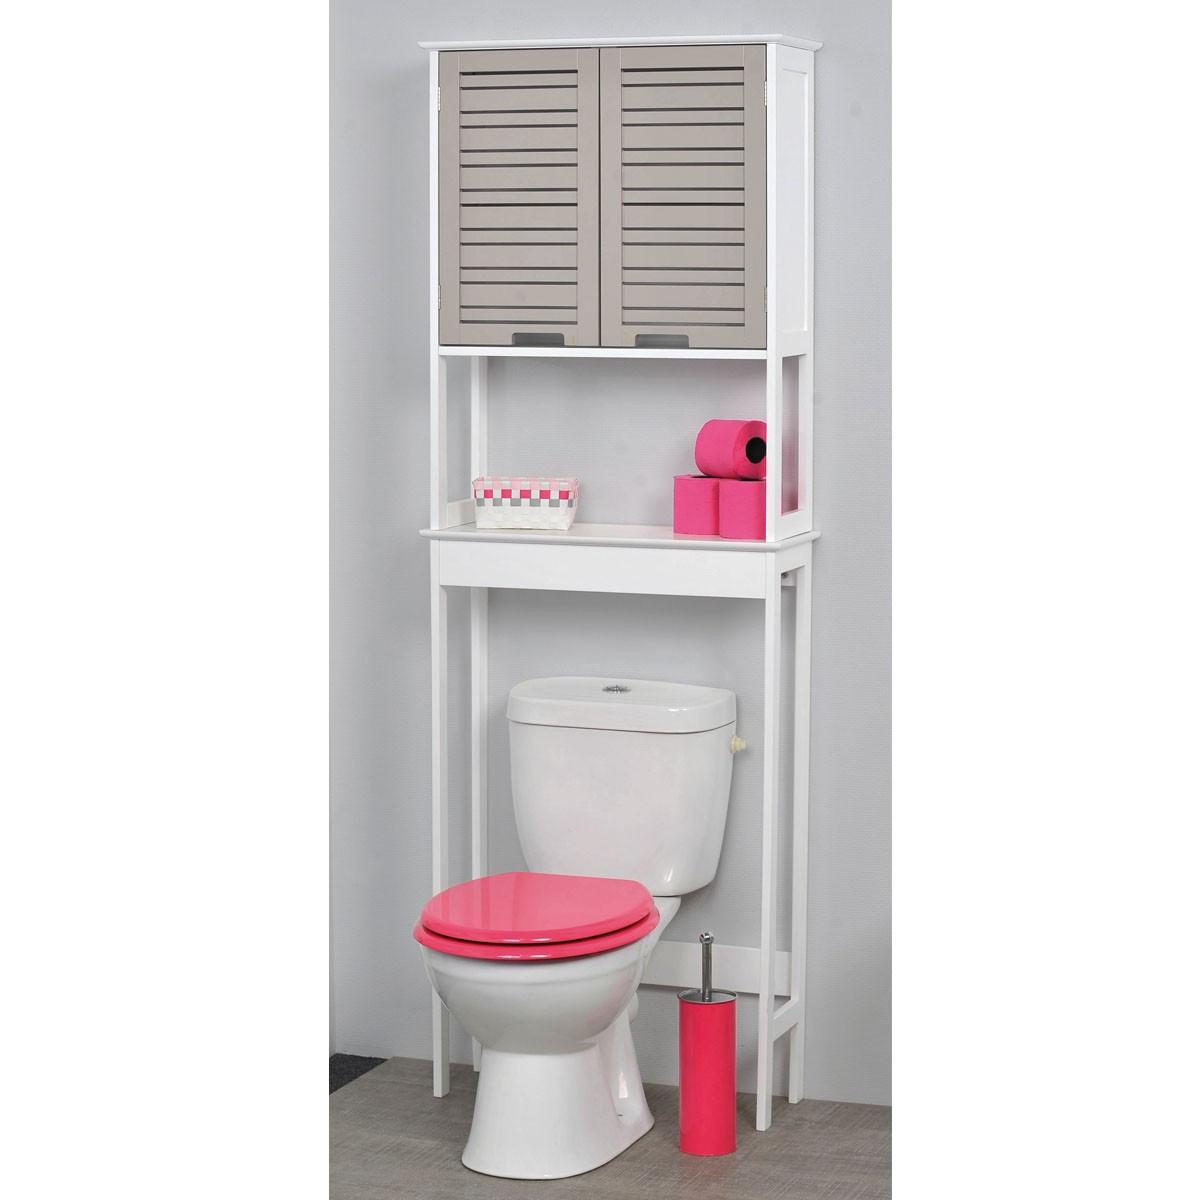 Meuble haut wc leroy merlin - tendancesdesign.fr